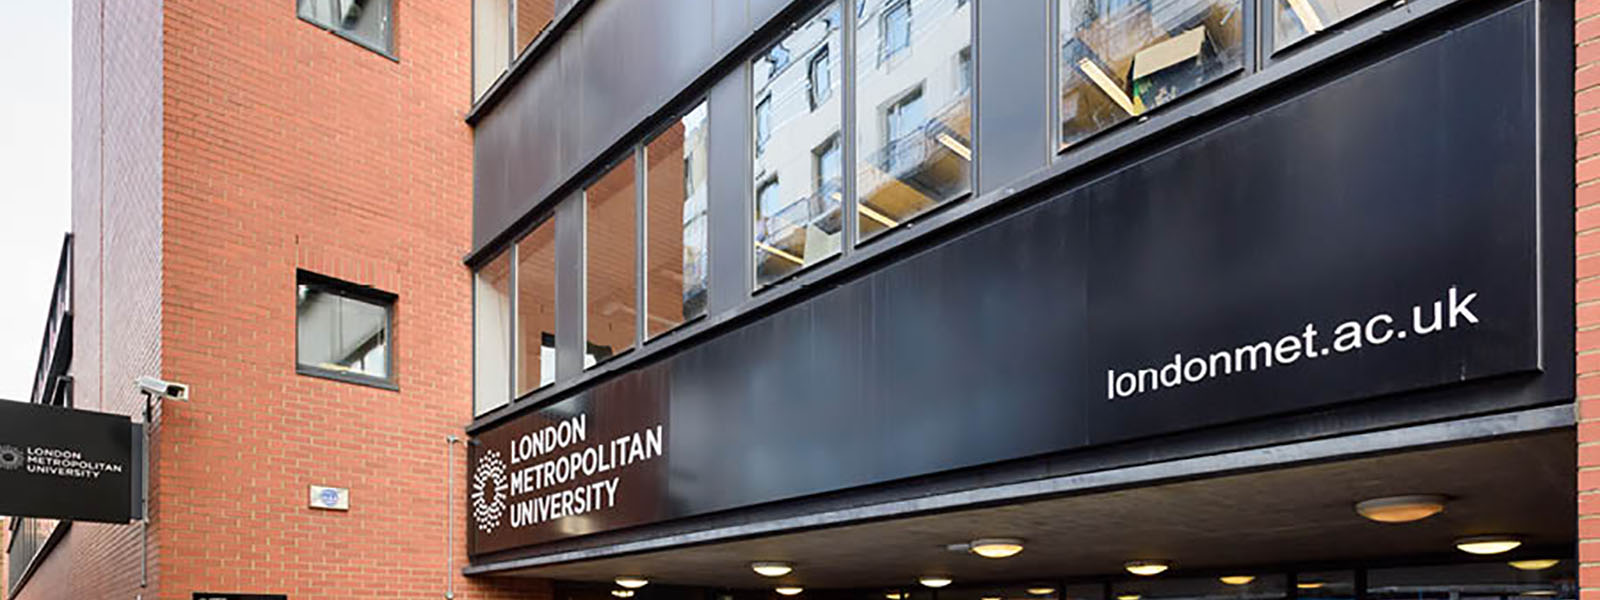 London Metropolitan University Validated Partner